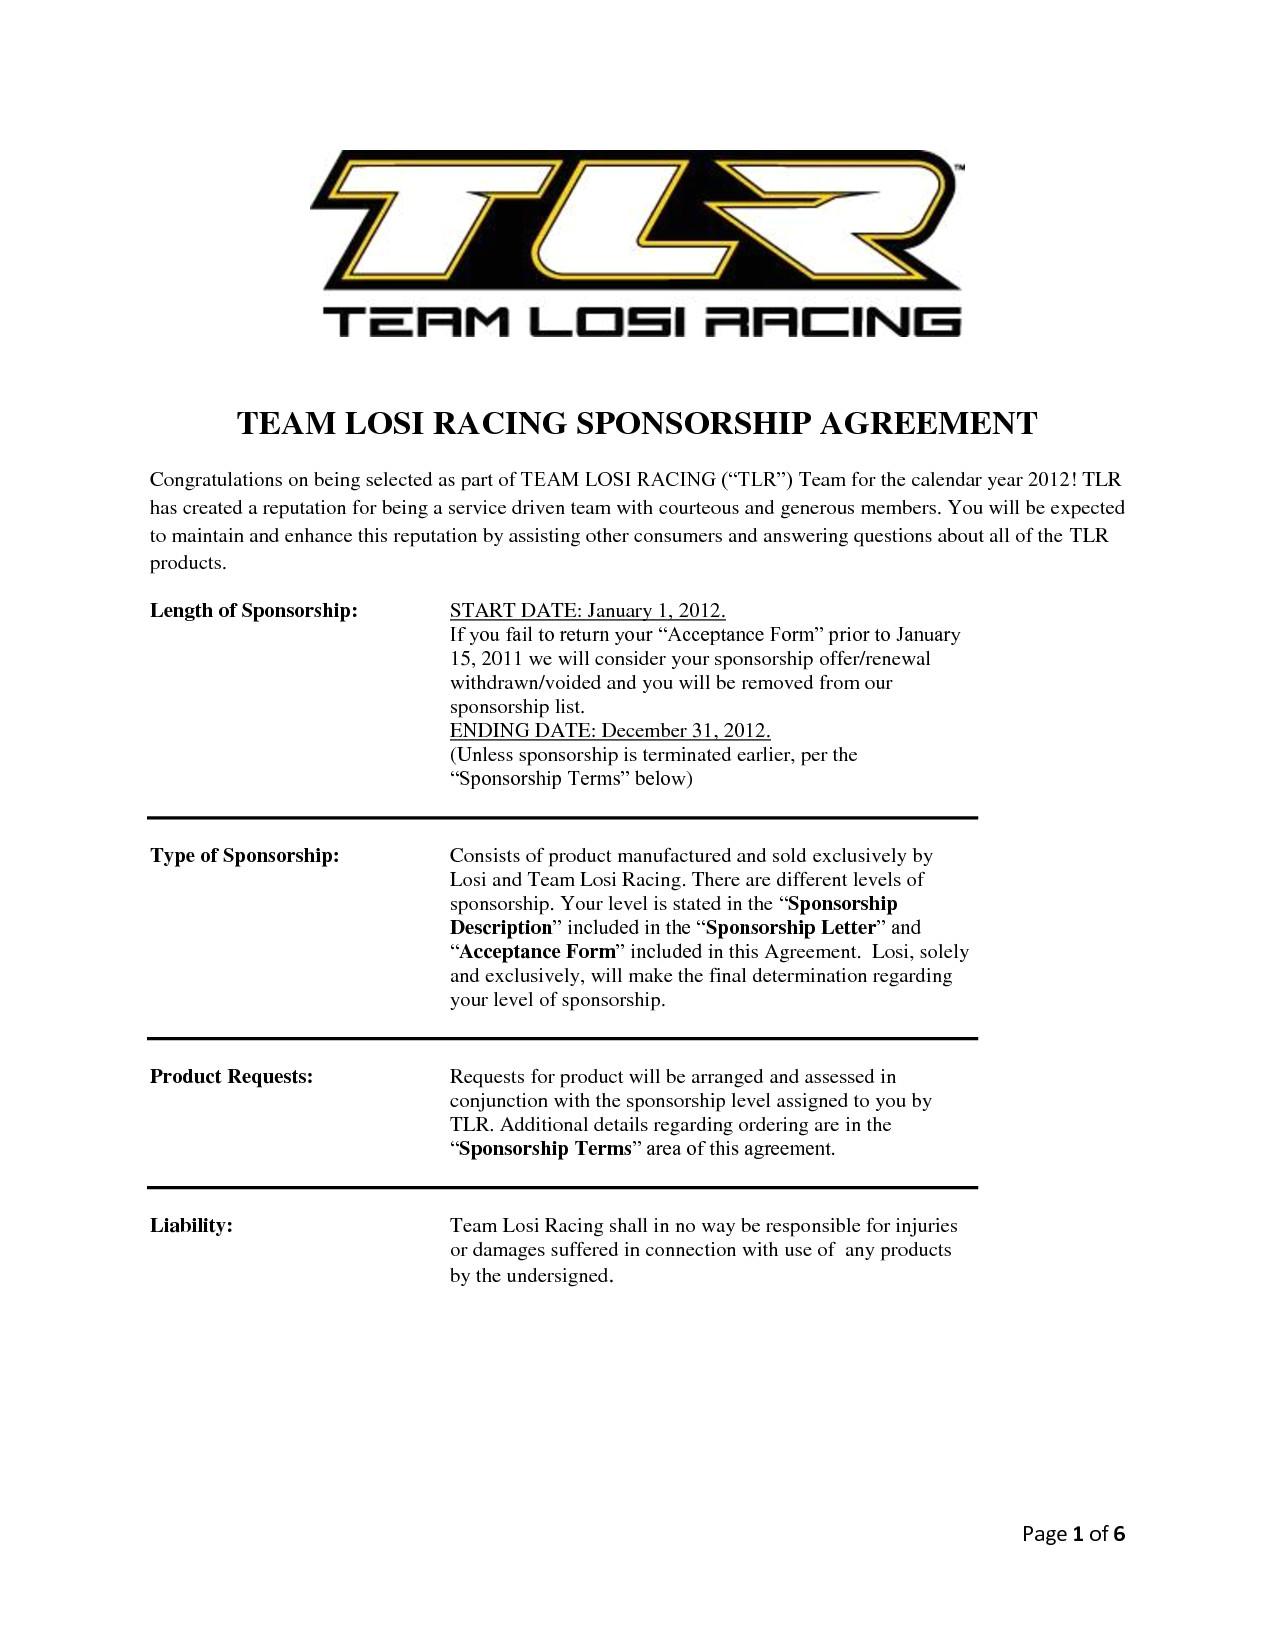 Motorsport Sponsorship Contract Template Team Losi Racing Sponsorship Agreement Chainimage